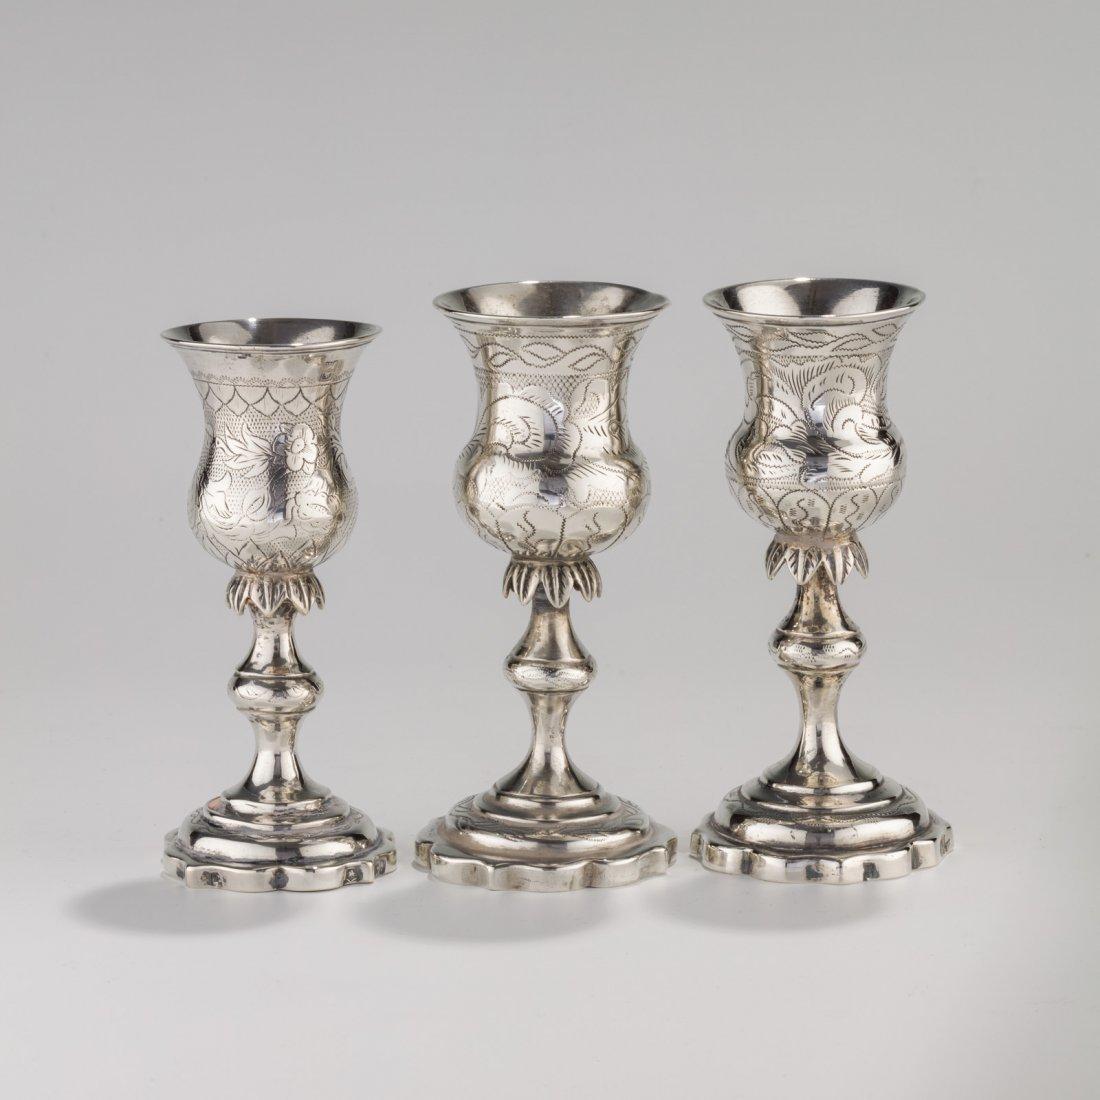 THREE SILVER KIDDUSH GOBLETS. Vilna, 19th century. Each